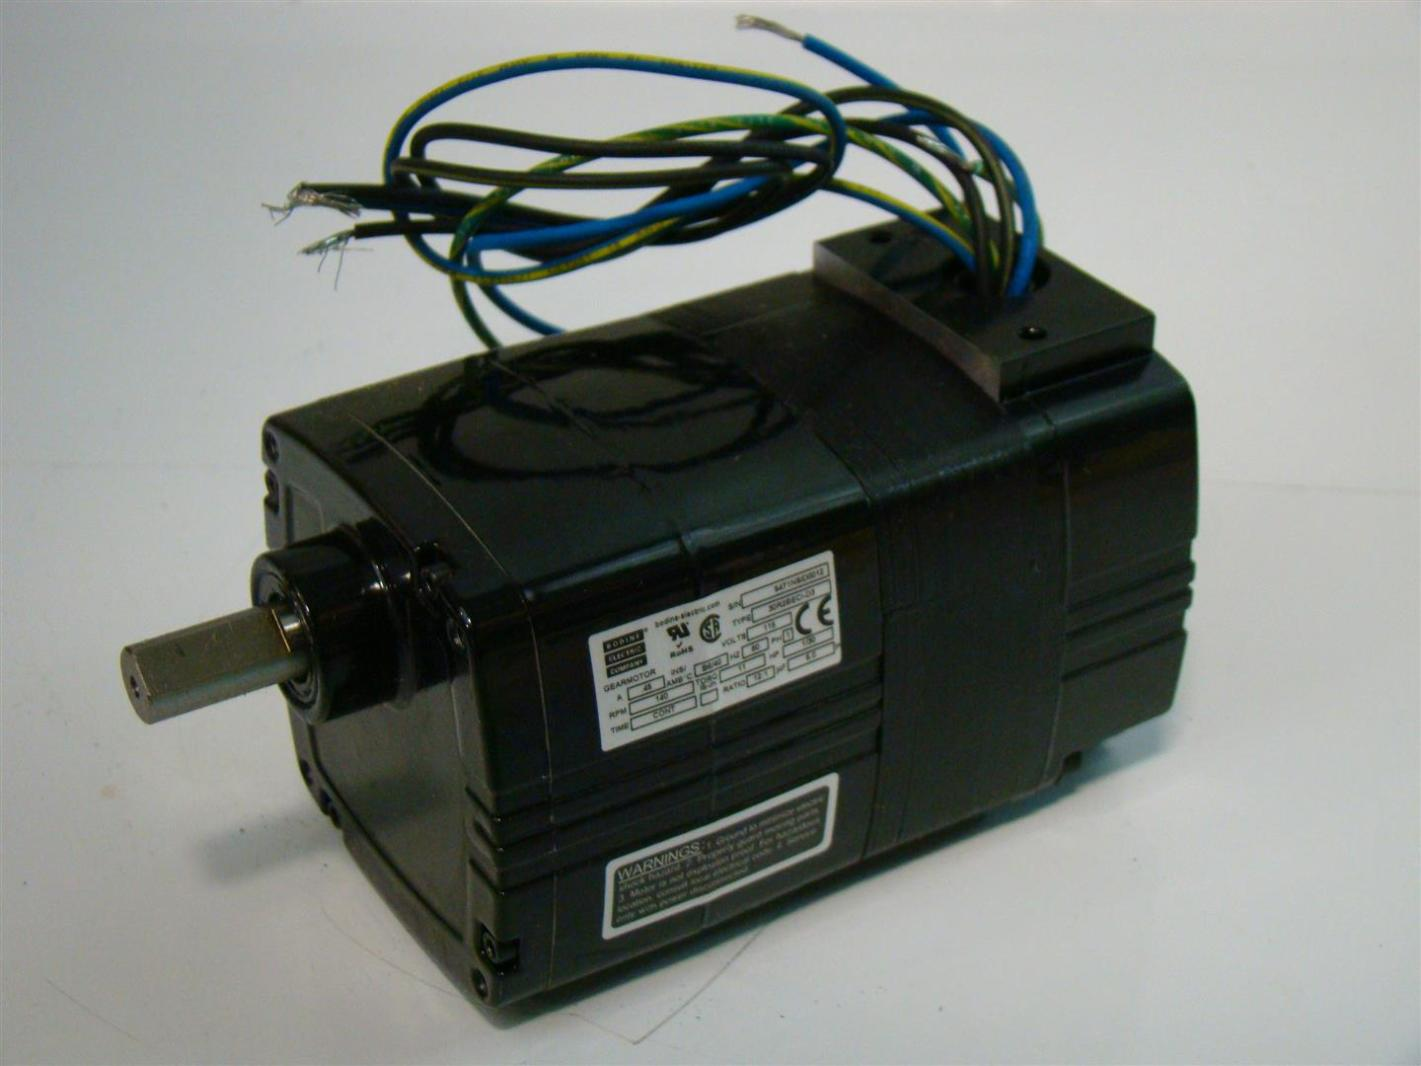 Bodine Electric Gearmotor 115v 30r2beci D3 5471nsid0012 Ebay